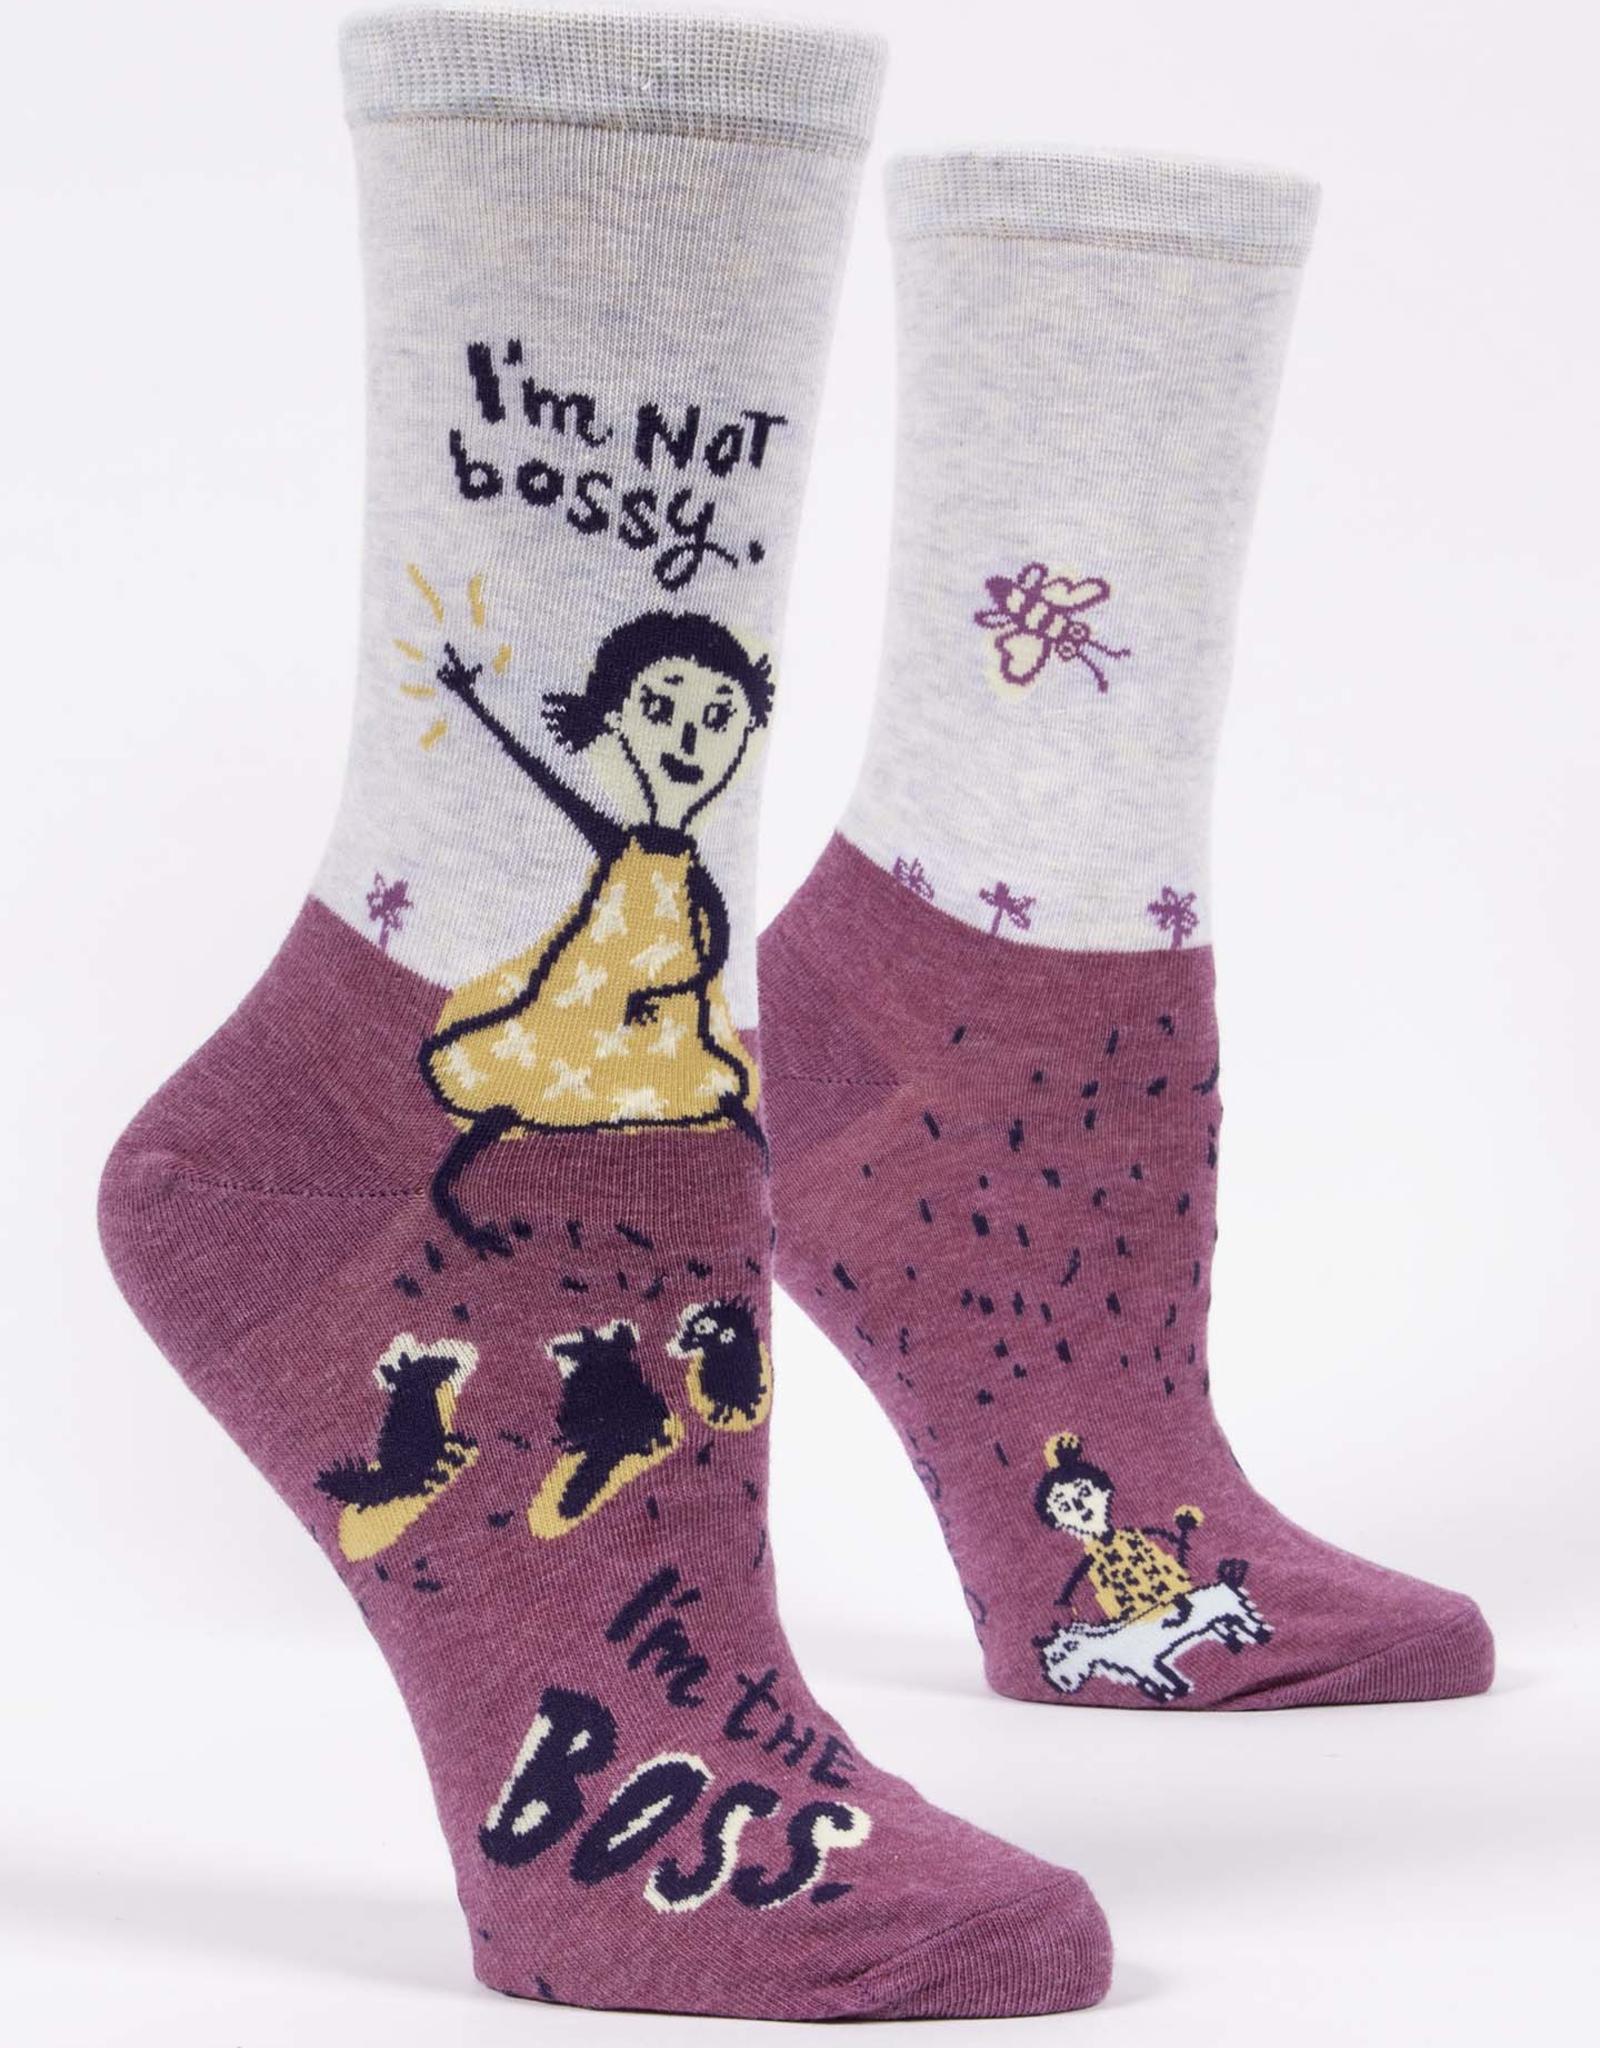 Blue Q Women's Socks - I'm Not Bossy, I'm The Boss